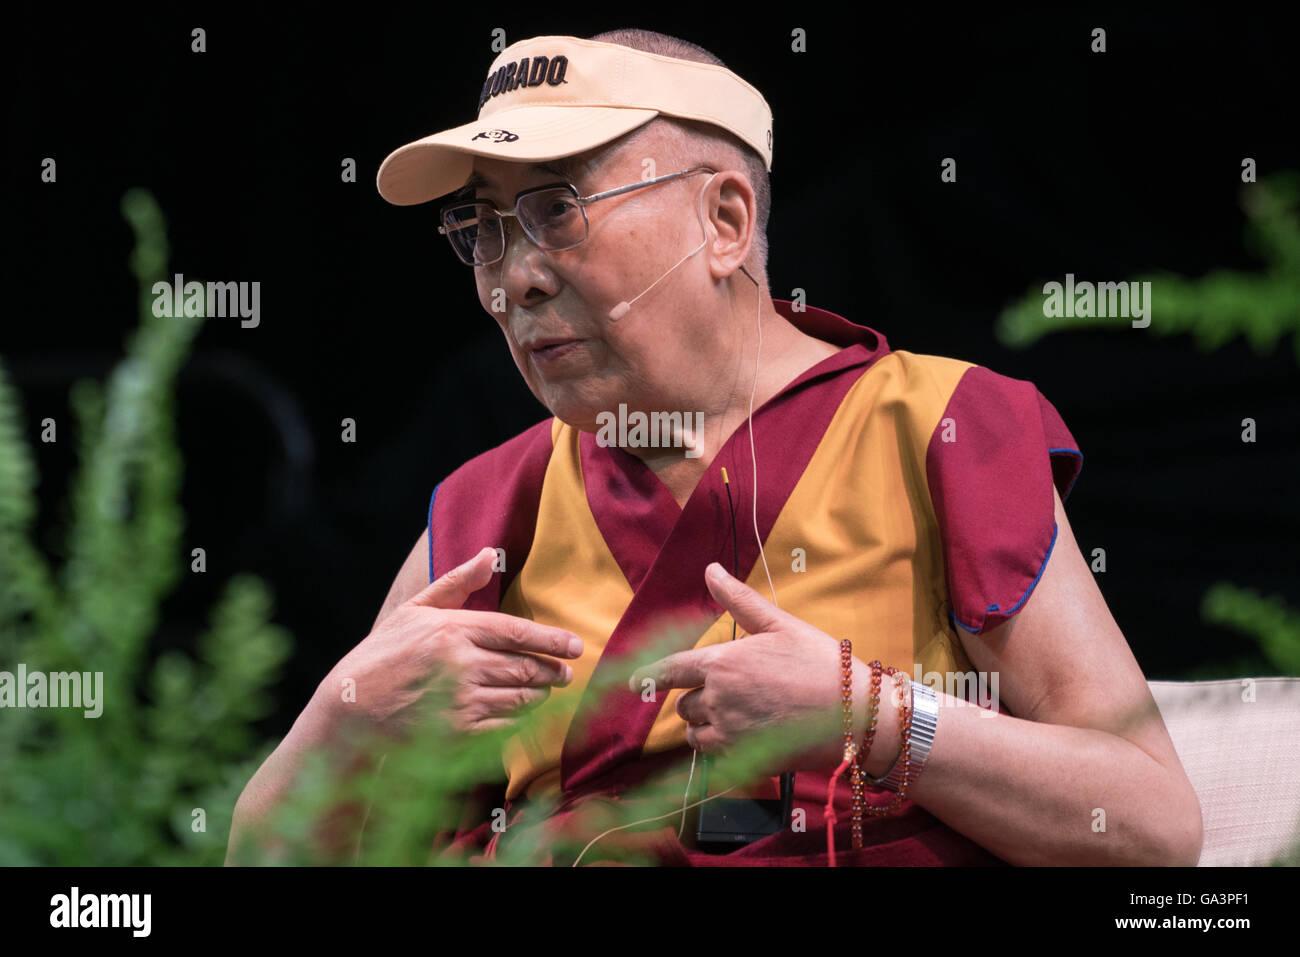 His Holiness the 14th Dalai Lama visits the University of Colorado in Boulder, Colorado - Stock Image